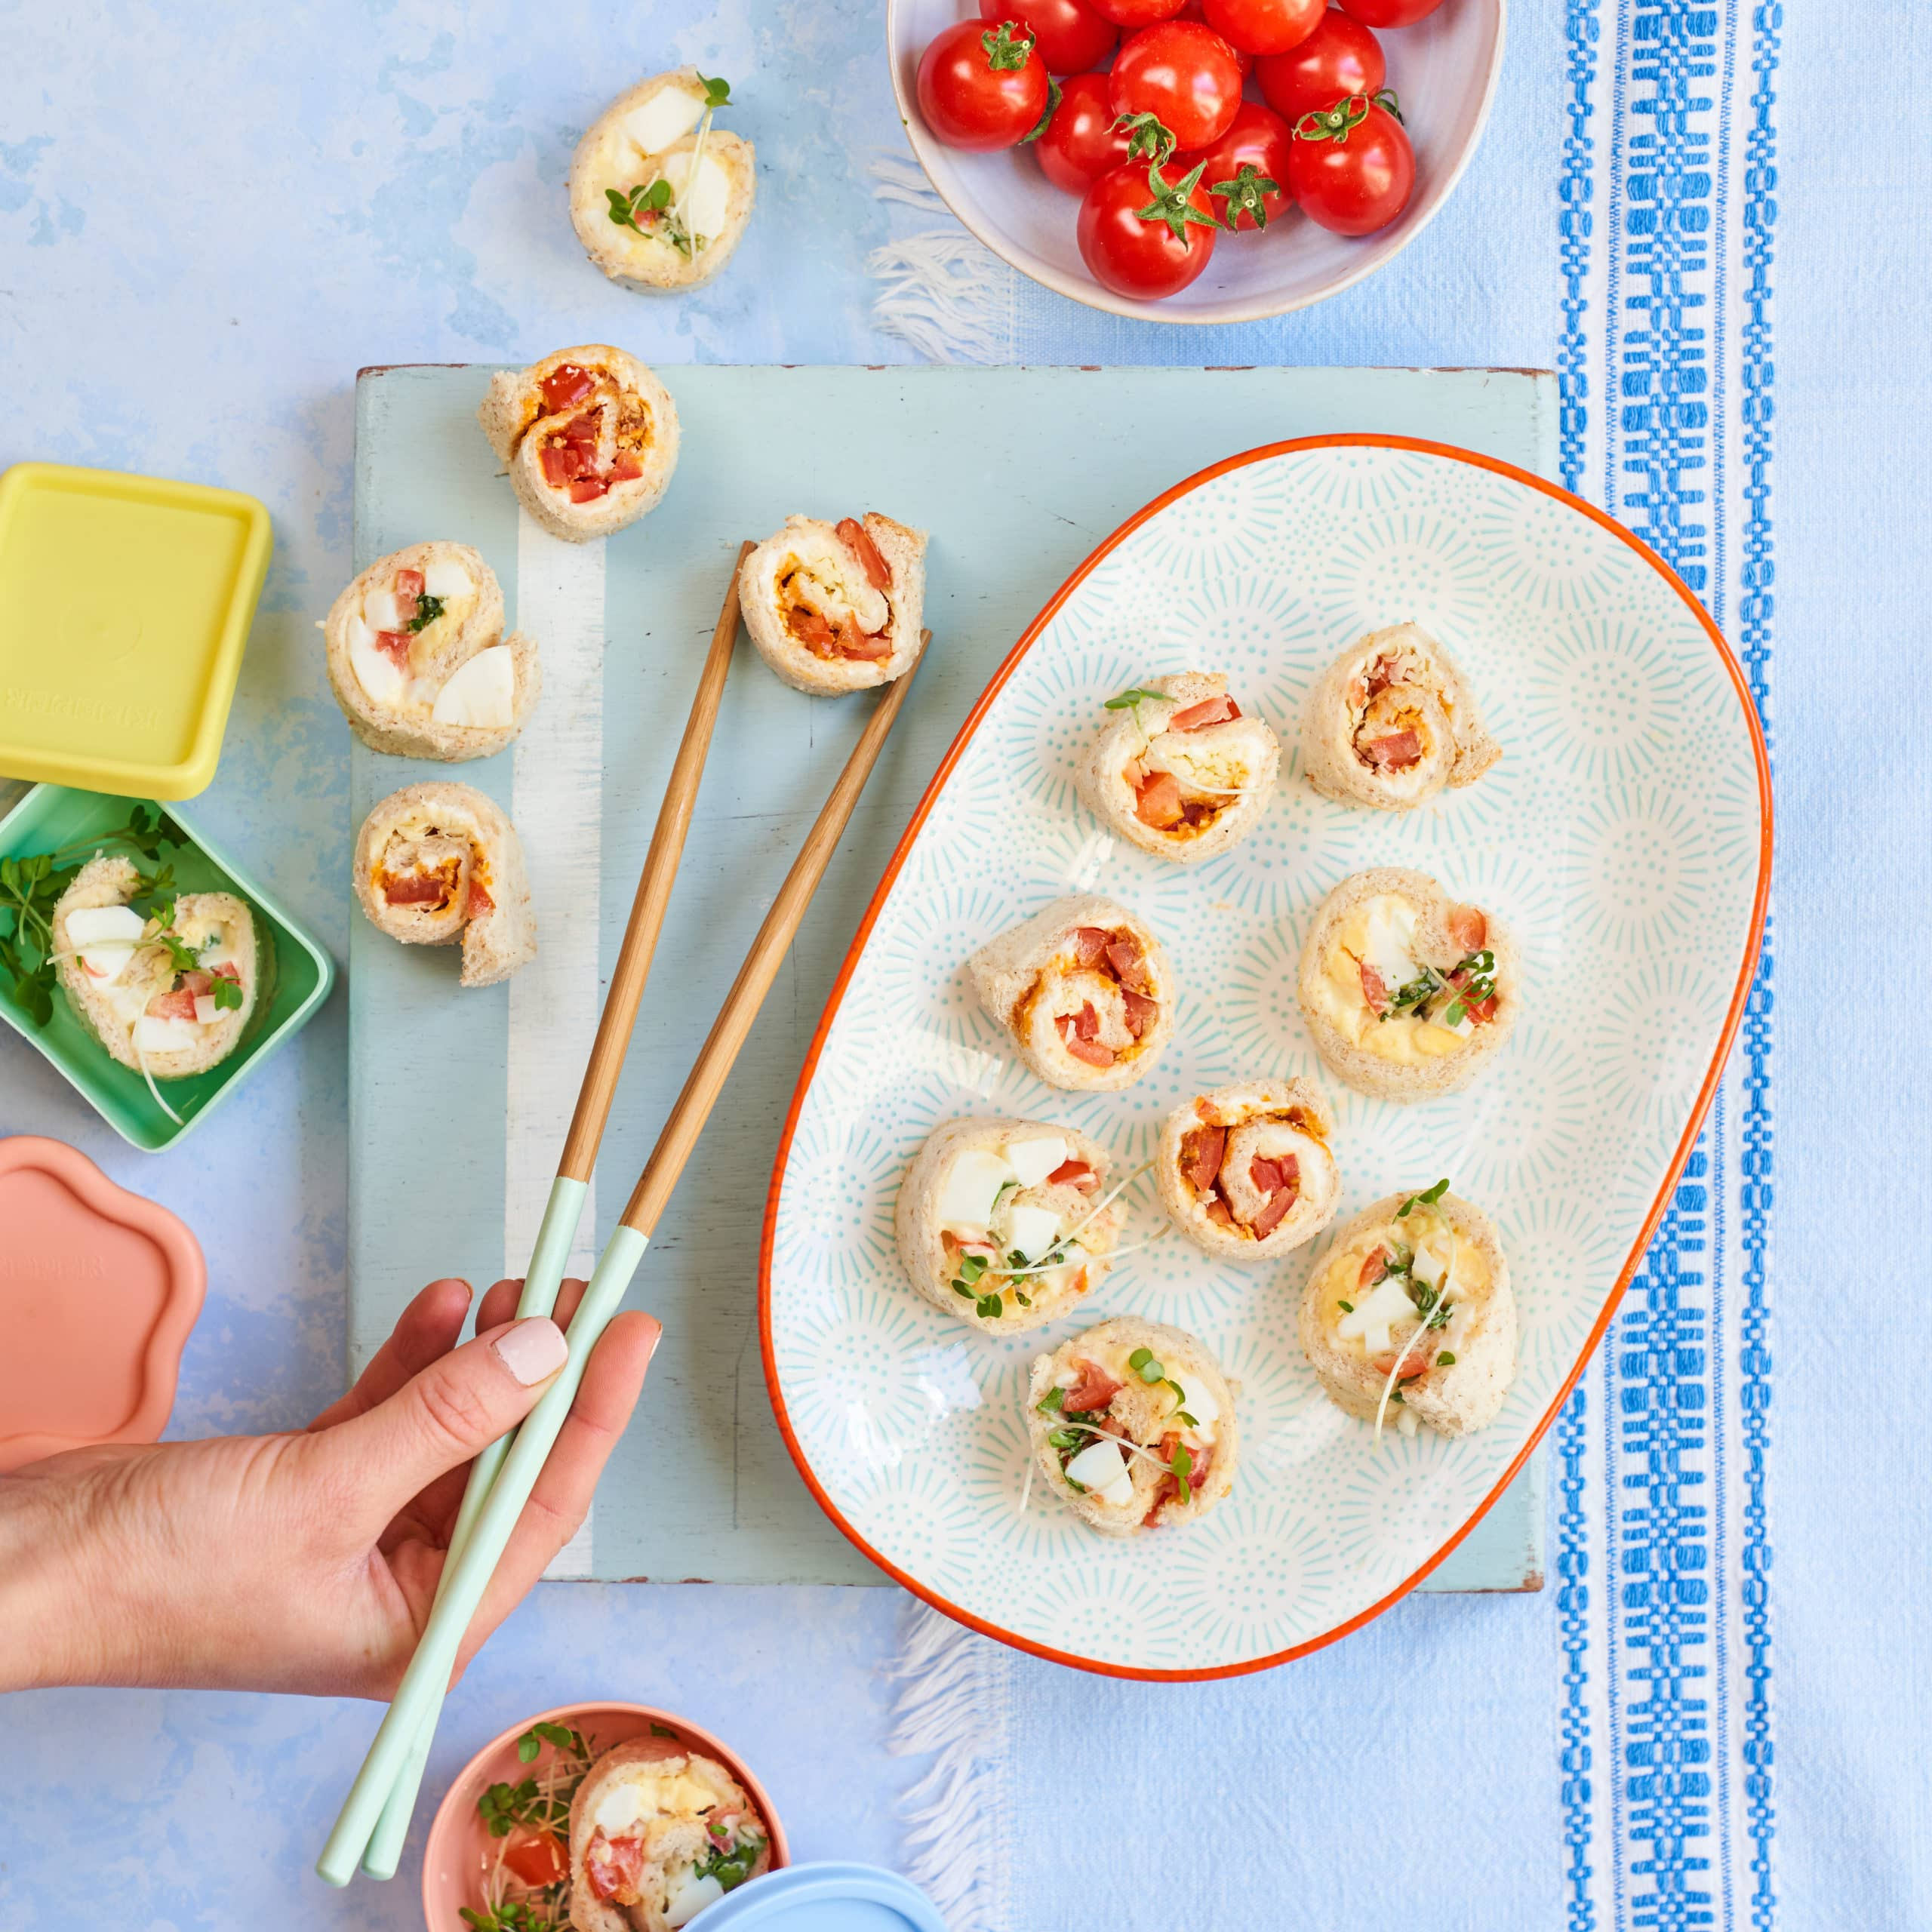 Piccolo Cherry Tomato Sushi Roll-ups recipe by Annabel Karmel